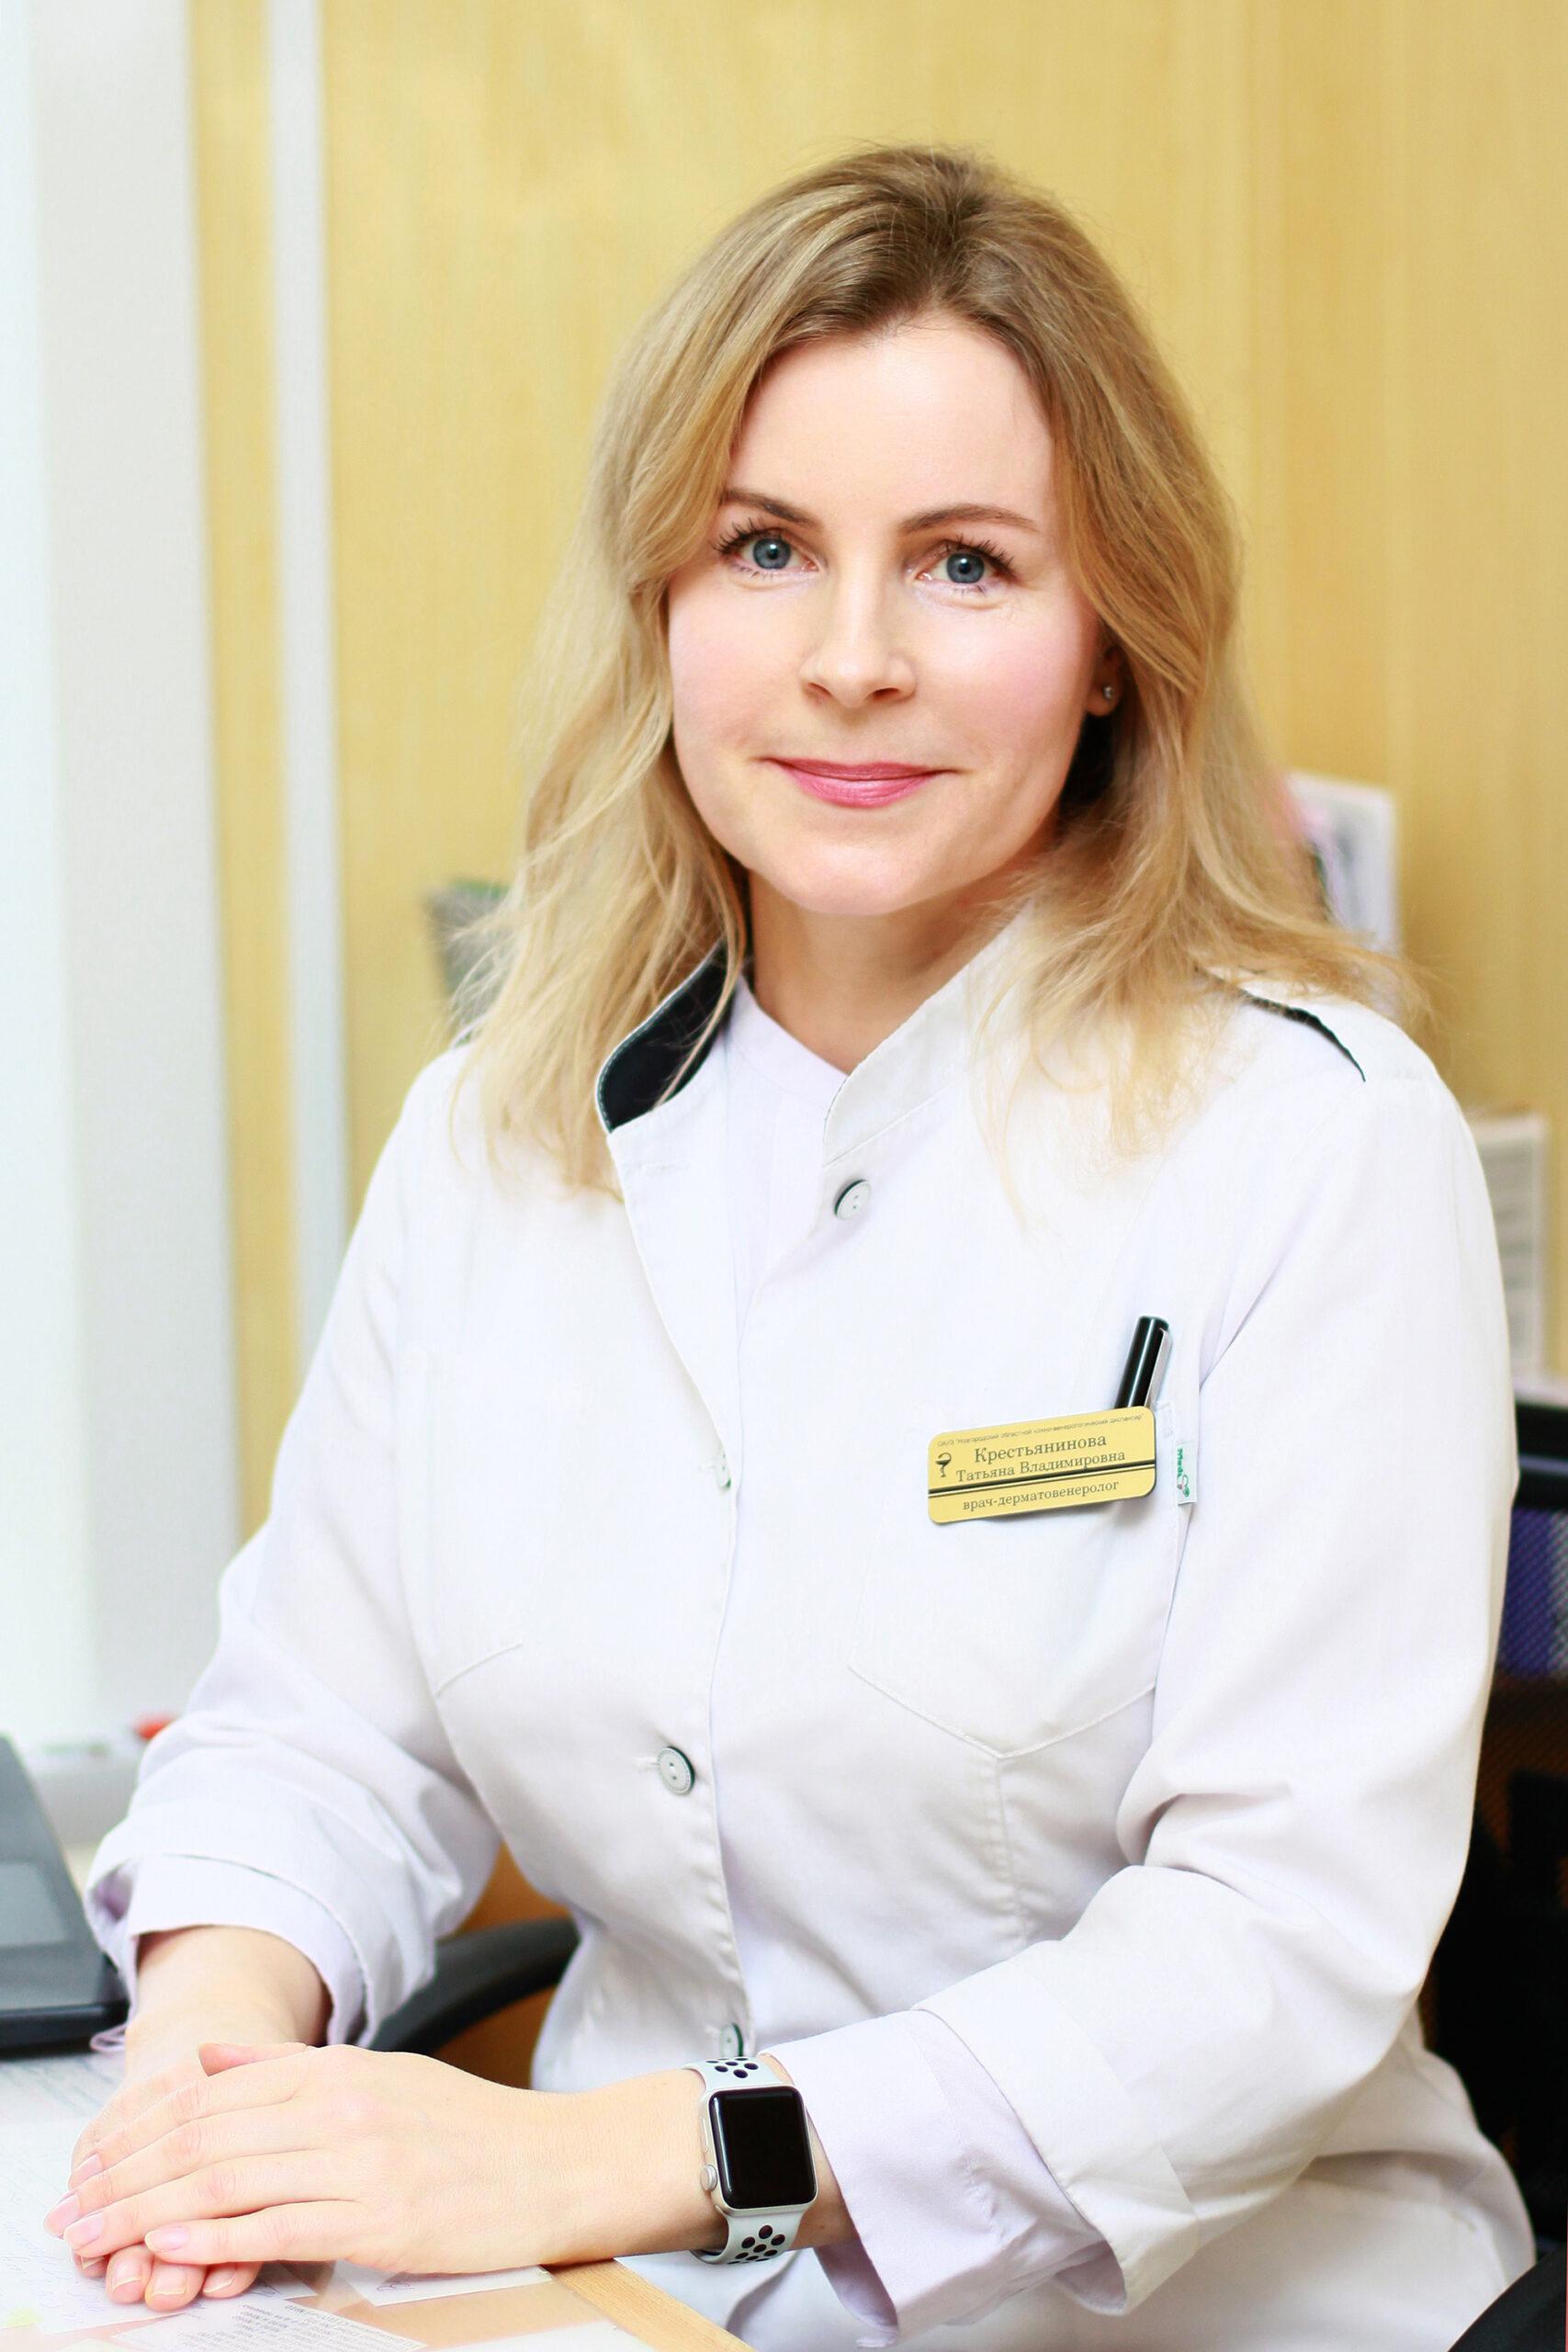 Крестьянинова Татьяна Владимировна